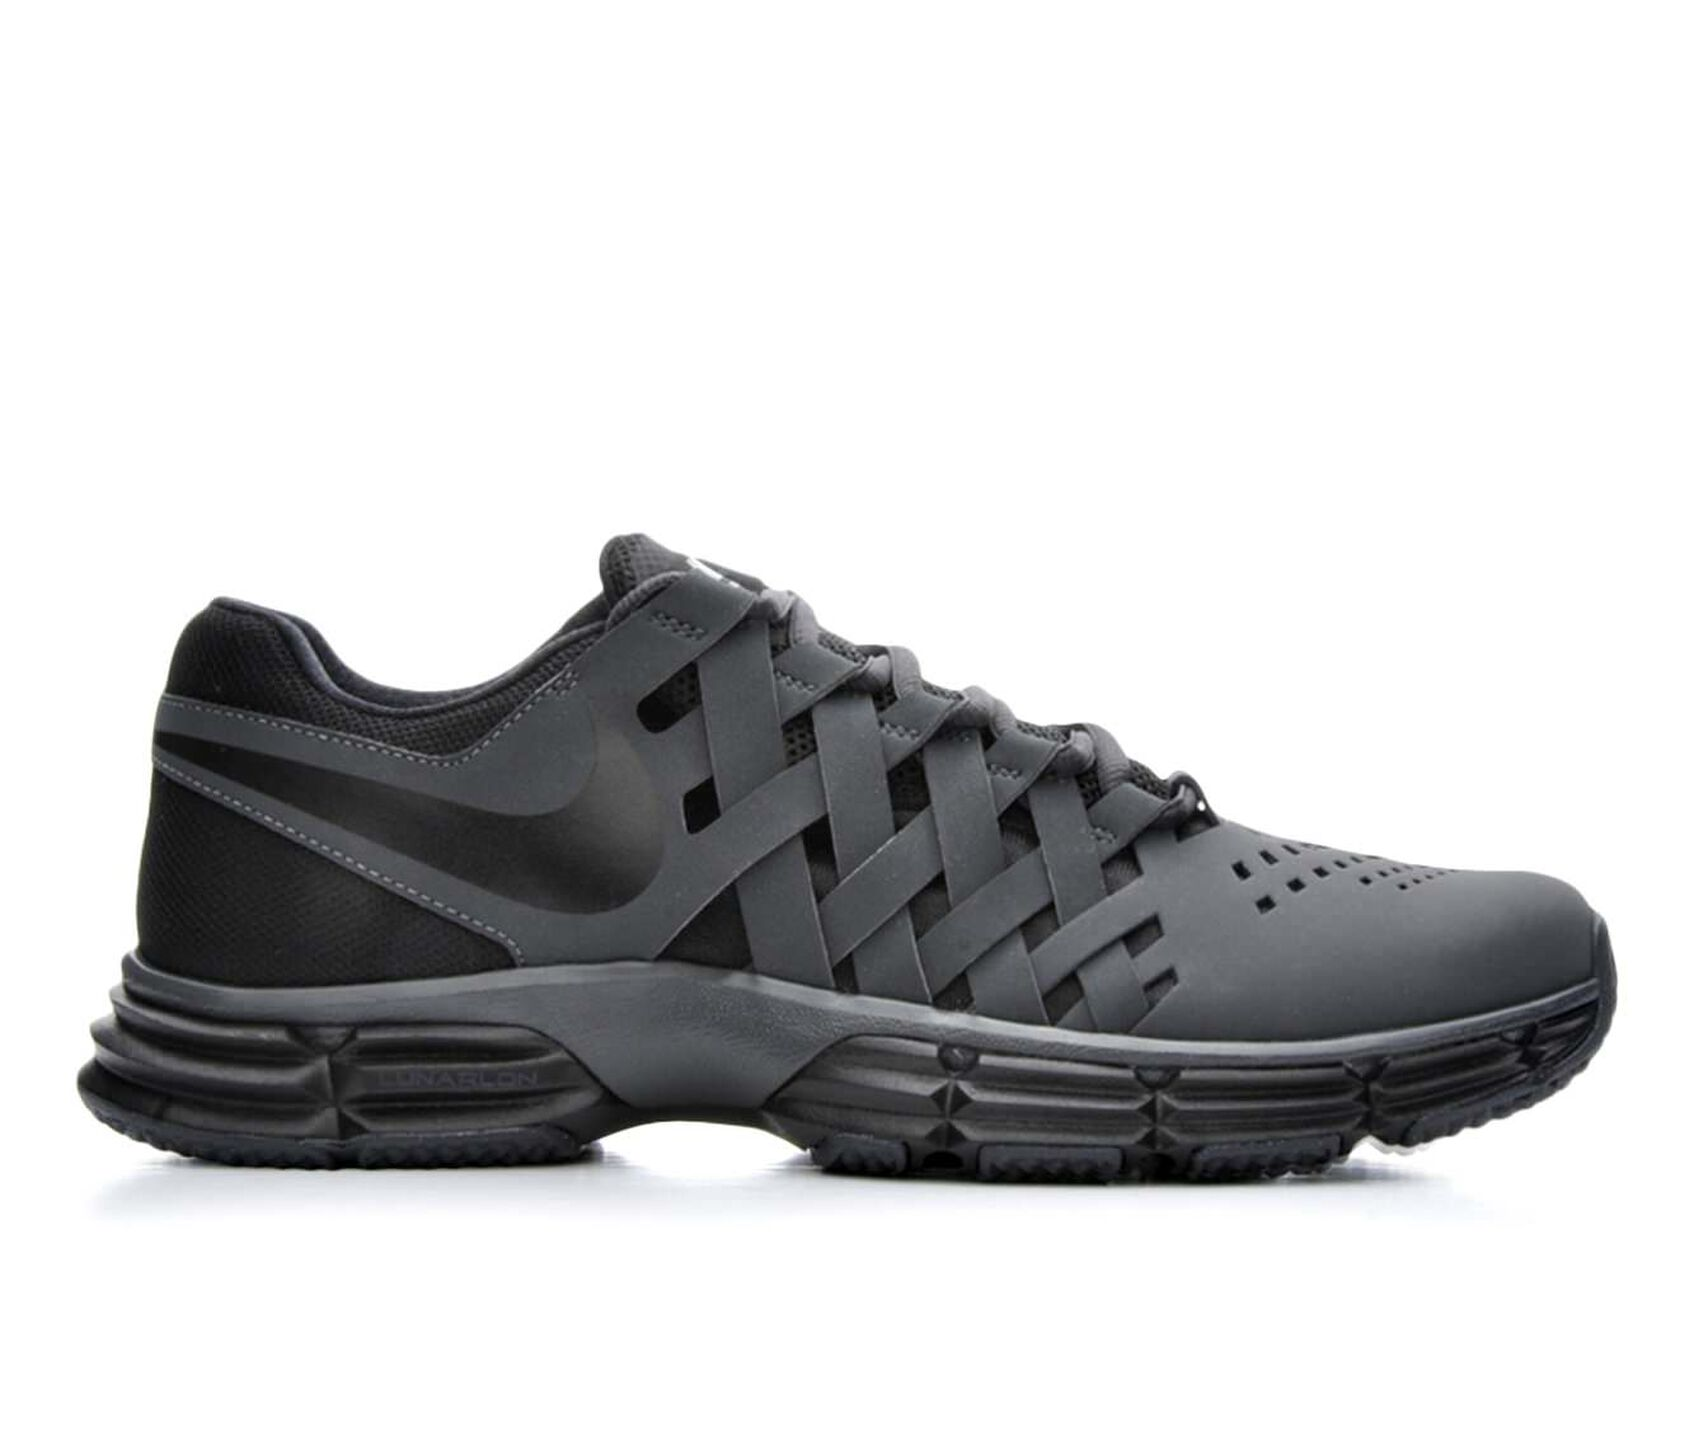 f86a1a1b7c4 ... Nike Lunar Fingertrap Training Shoes. Carousel Controls